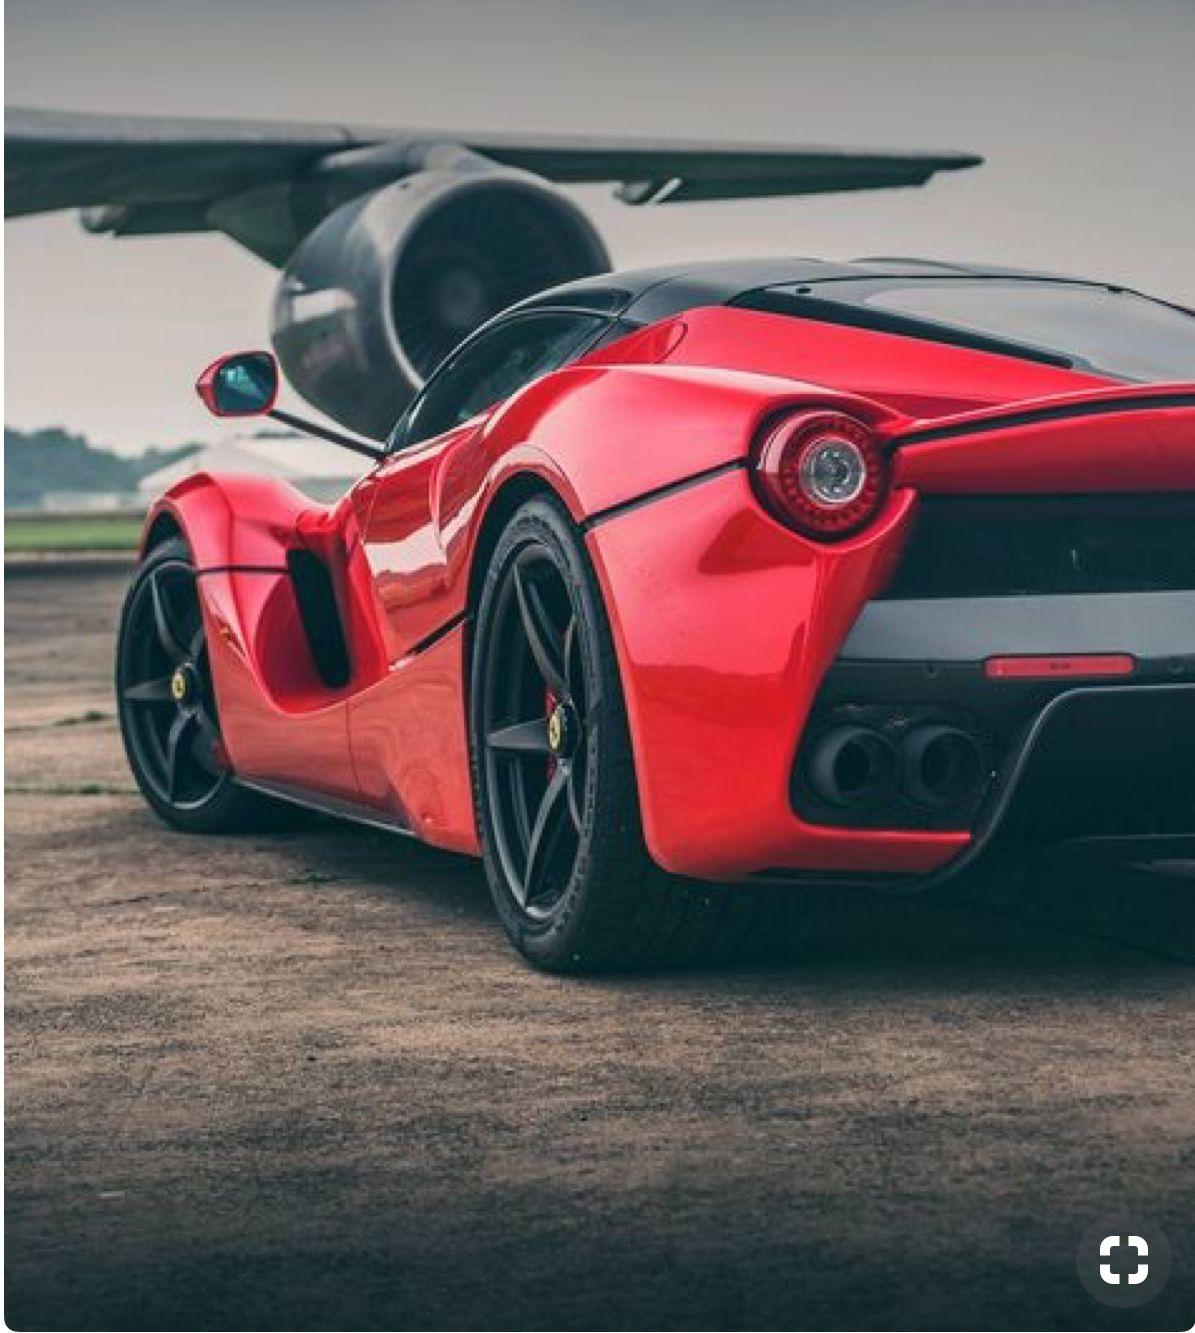 The 2019 Ferrari F80 Price New 2018 2019 Car Prices In 2019